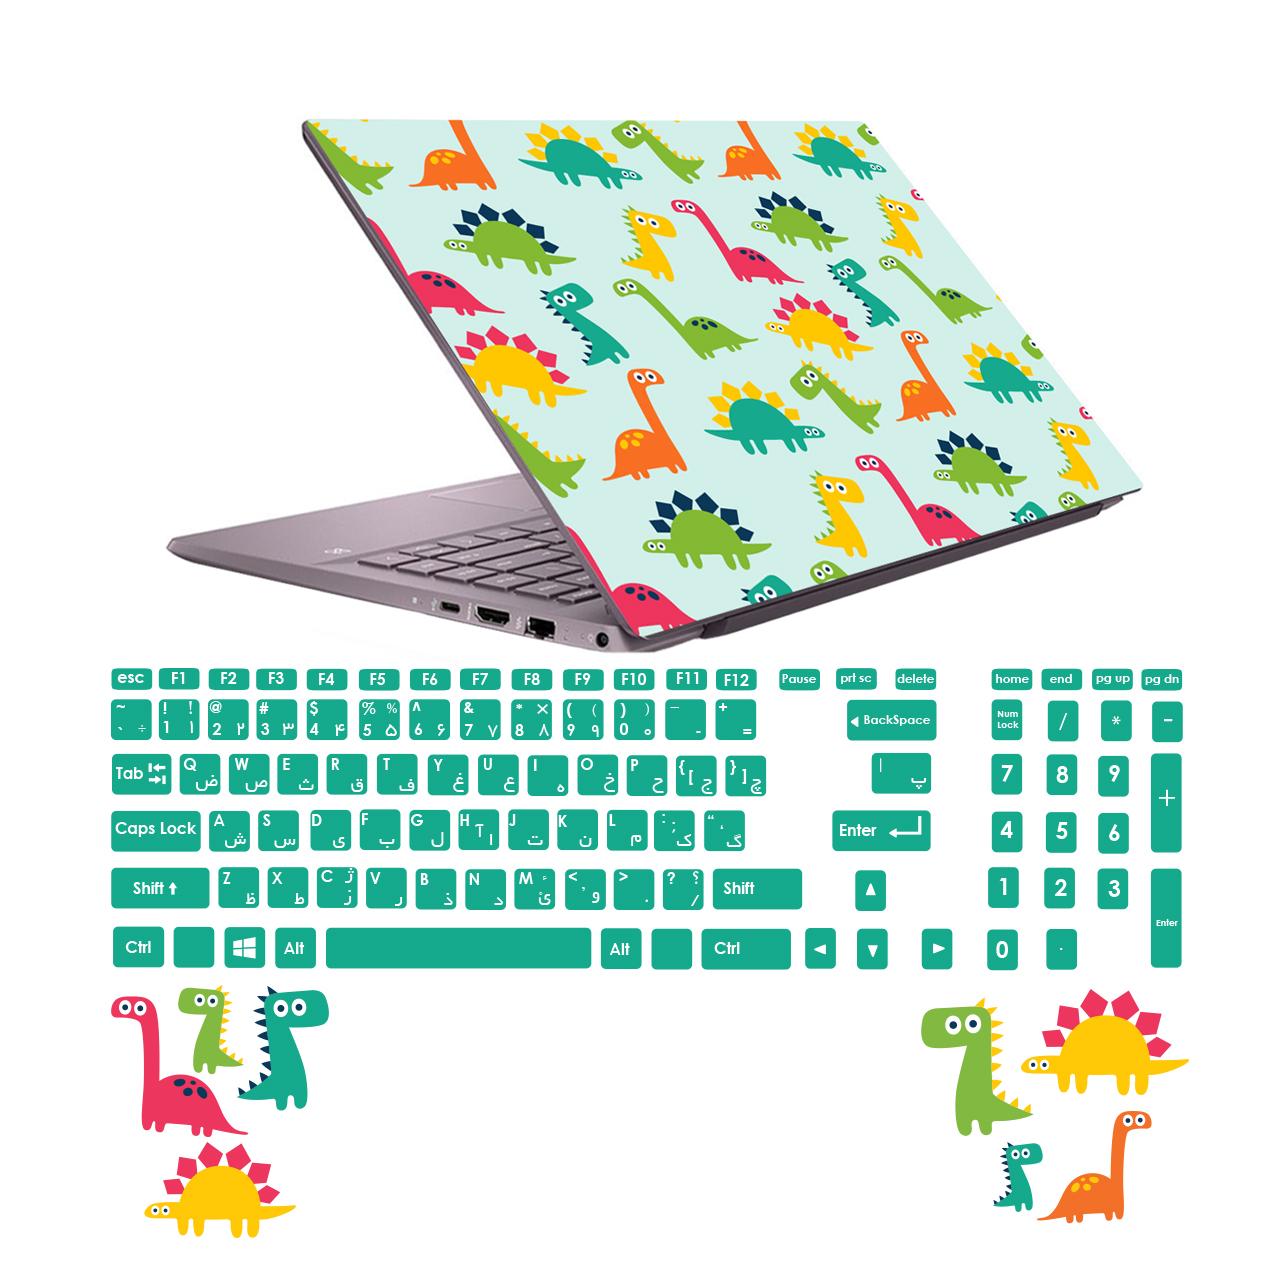 استیکر لپ تاپ صالسو آرت مدل 5029 hk به همراه برچسب حروف فارسی کیبورد